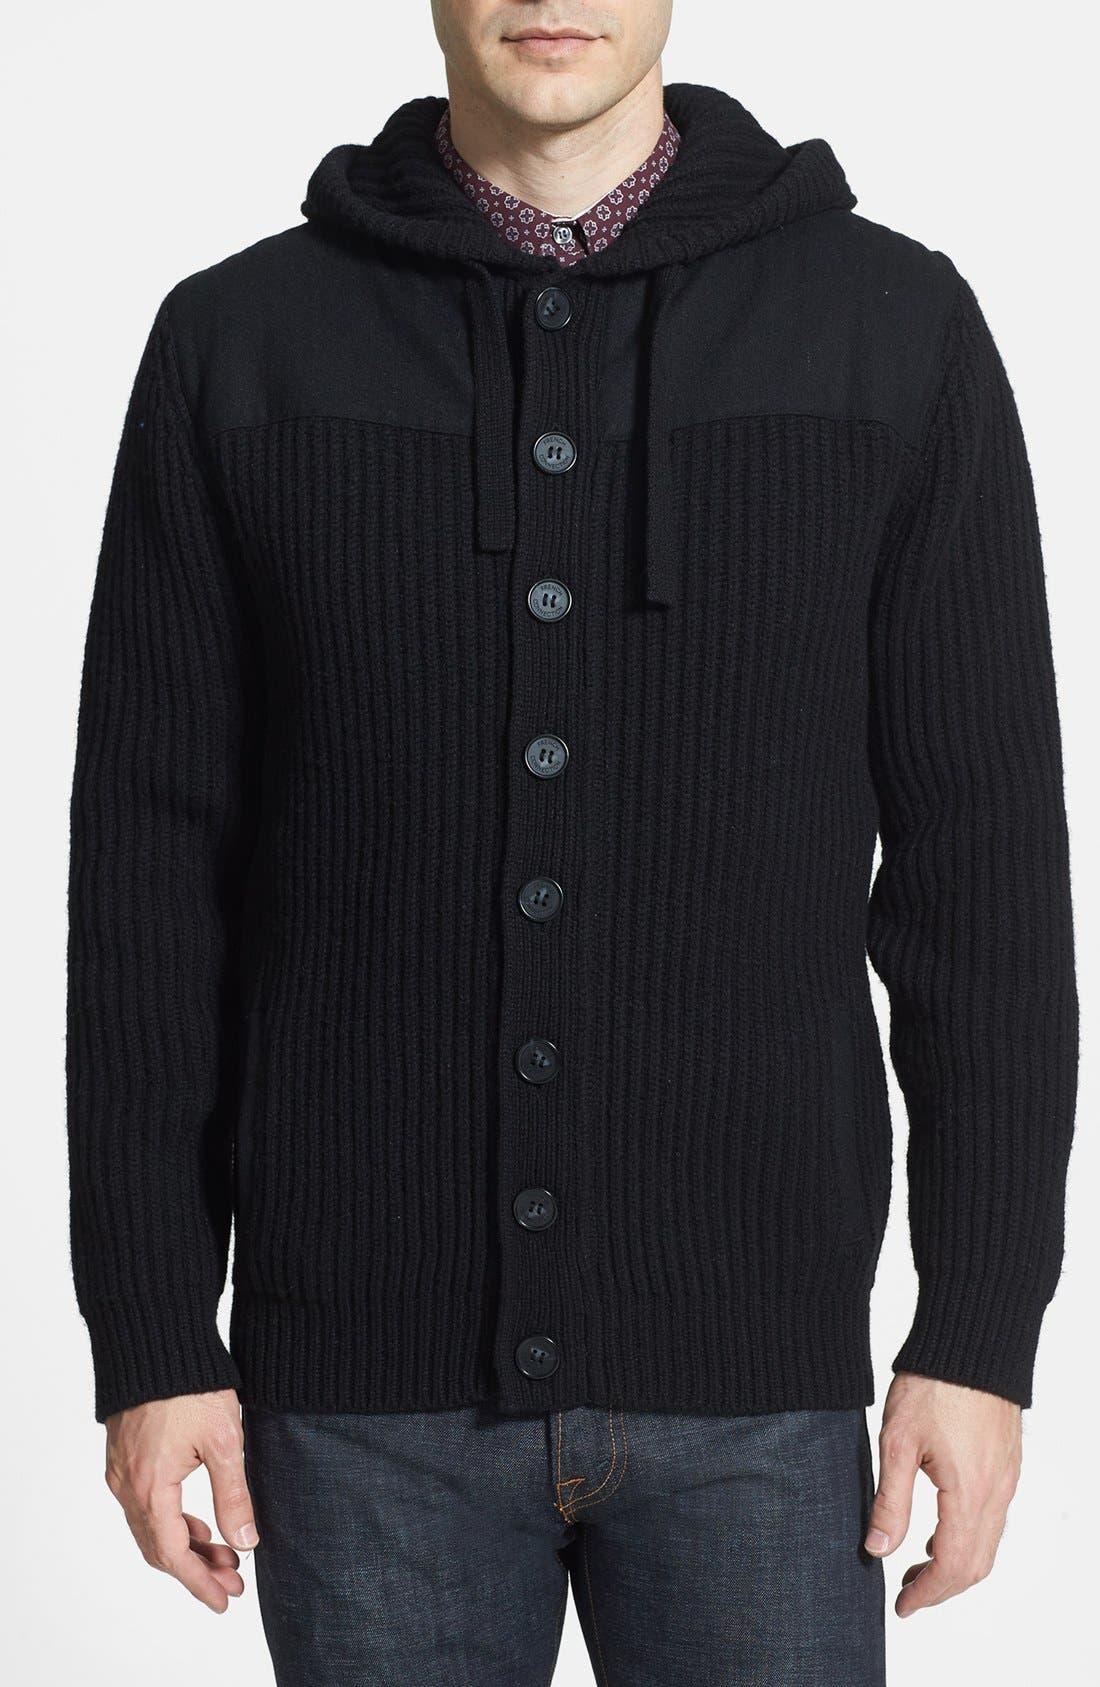 Main Image - French Connection 'Myrrh Patch Melton' Sweater Jacket